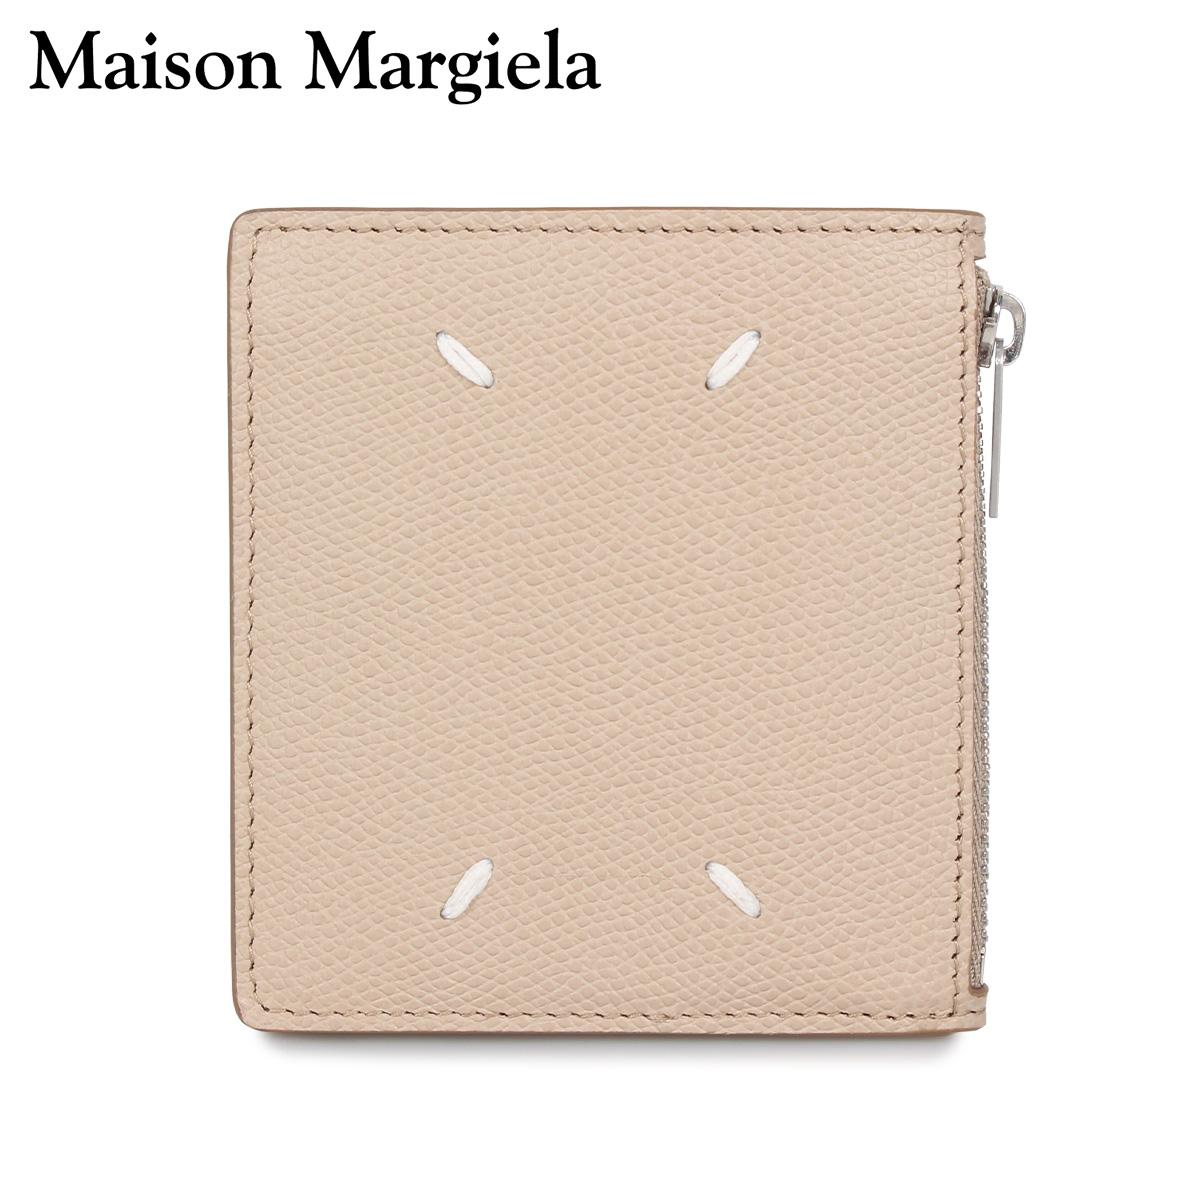 MAISON MARGIELA メゾンマルジェラ 財布 二つ折り メンズ レディース WALLET ベージュ S35UI0448-T2352 [3/4 新入荷]